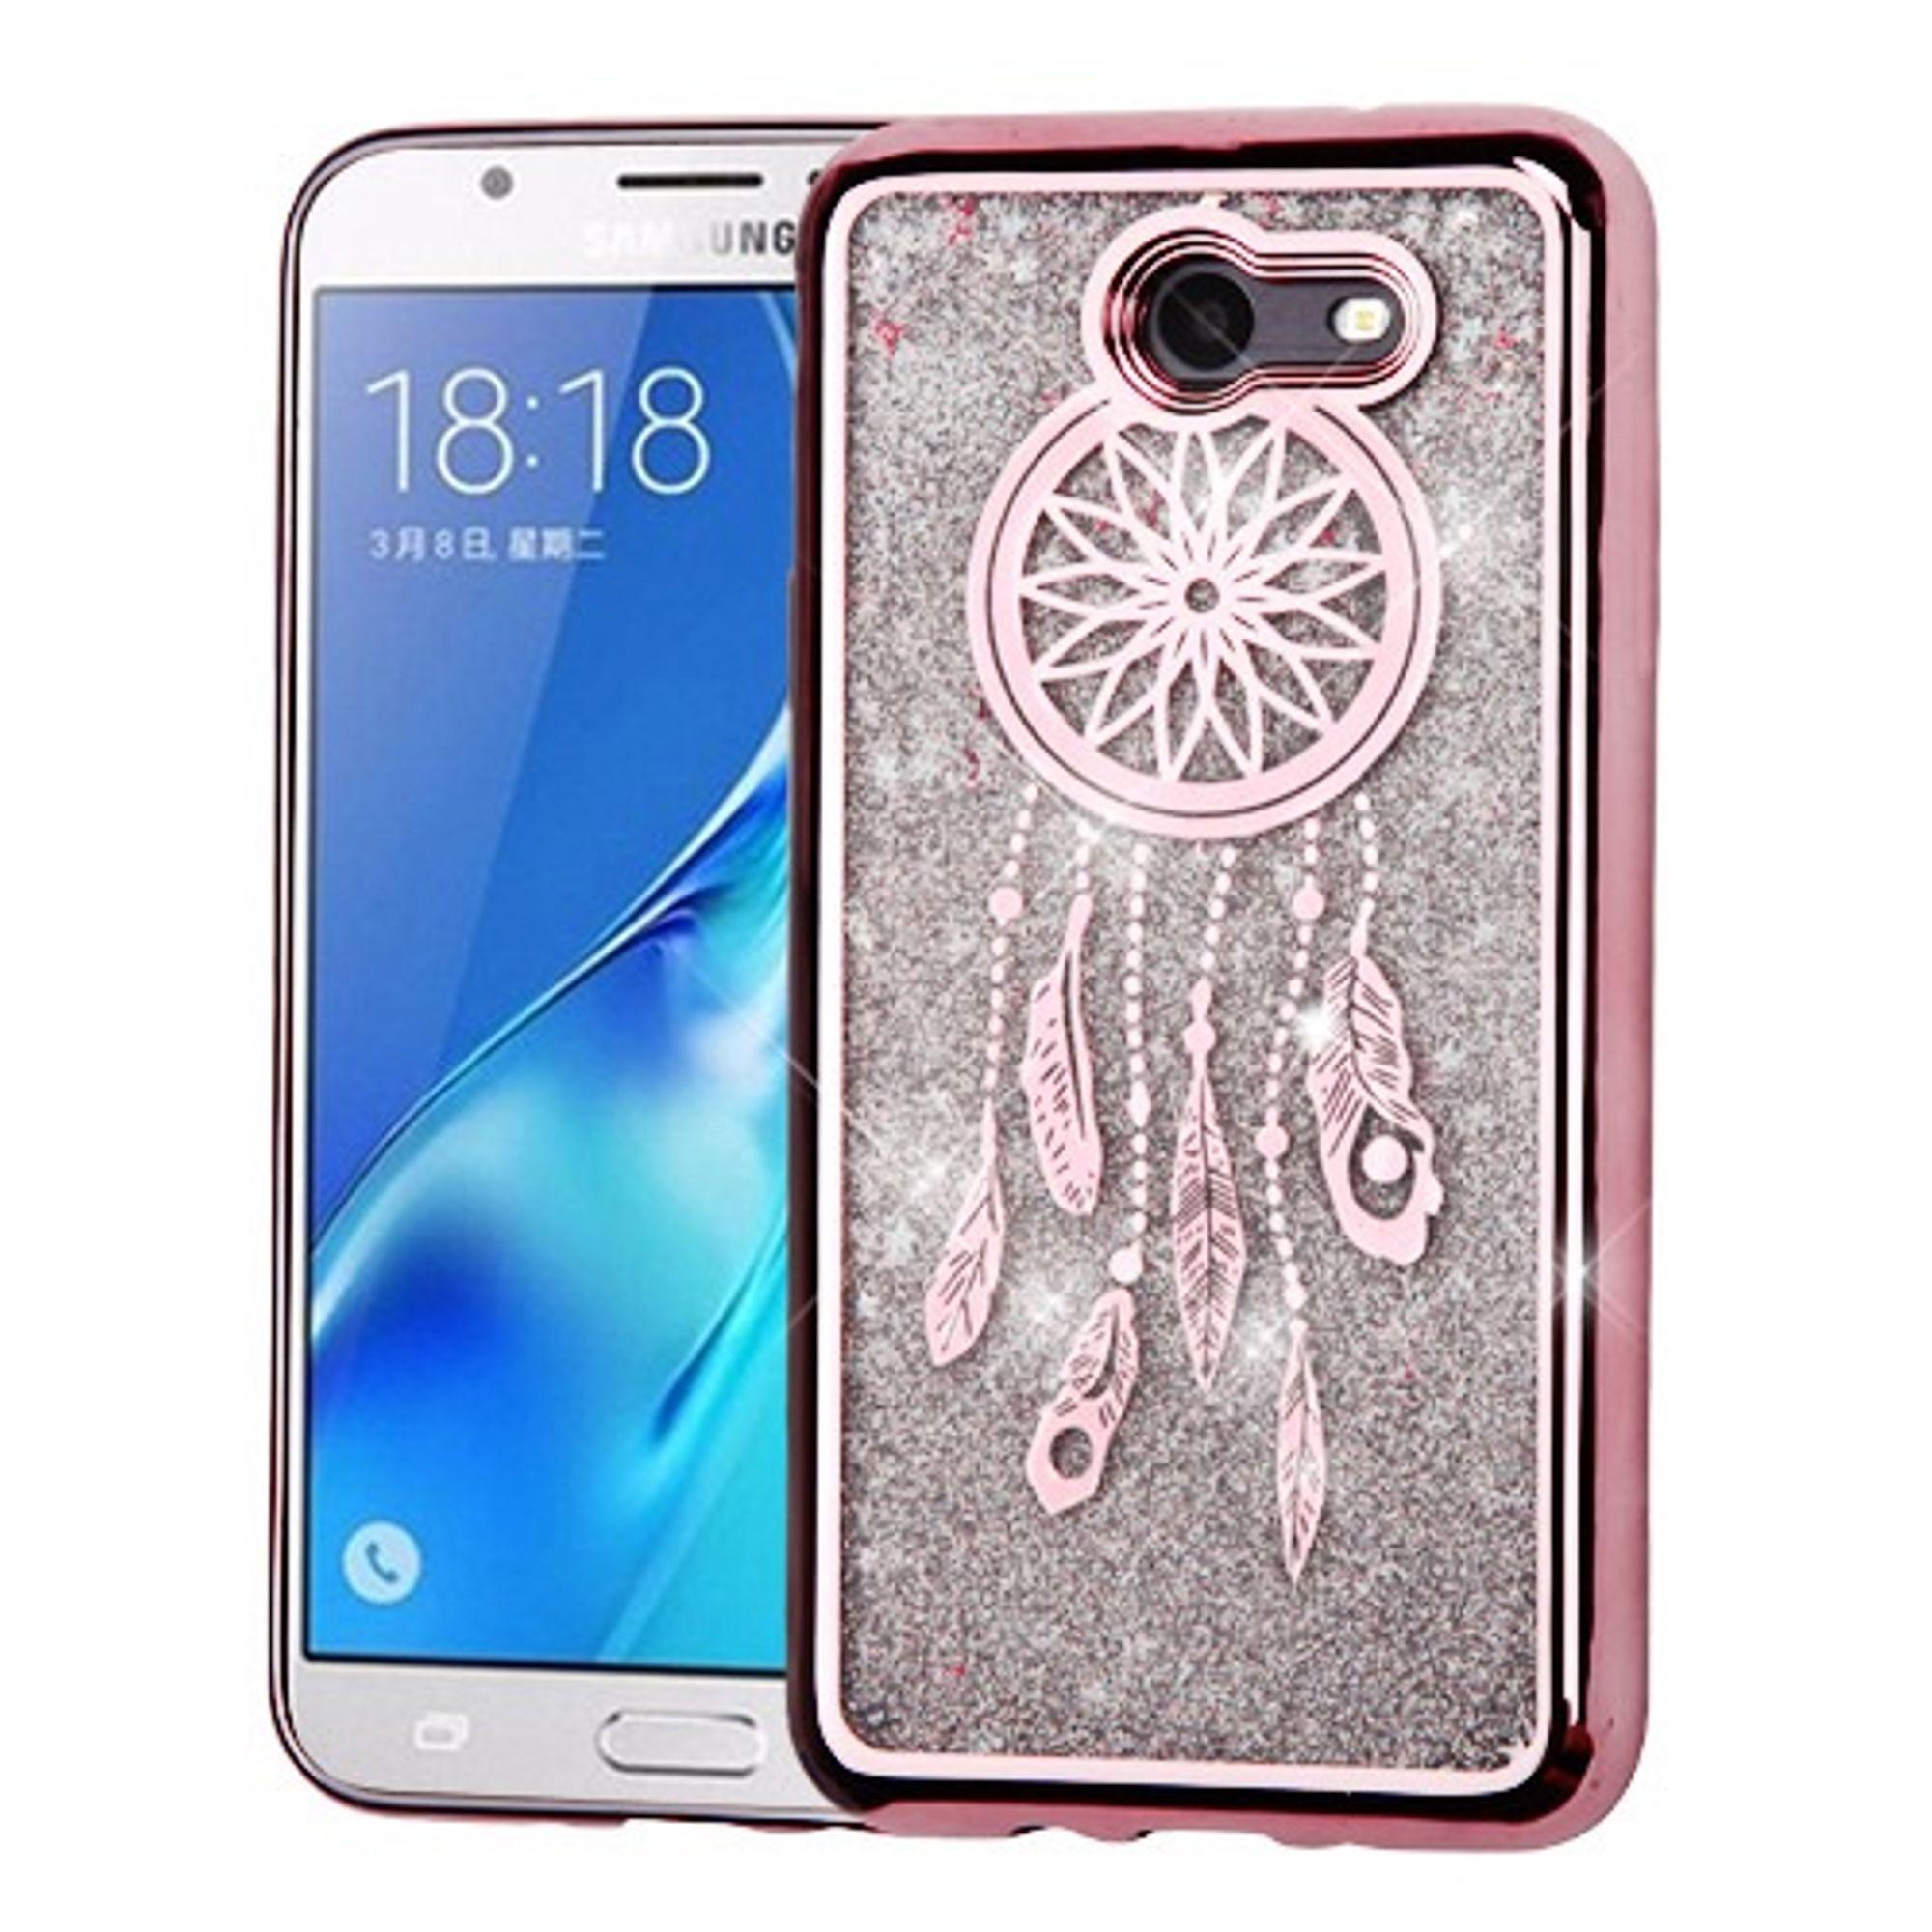 Samsung Galaxy J7 Sky Pro case by Insten Luxury Quicksand Glitter Liquid Floating Sparkle Bling Fashion Phone Case Cover for Samsung Galaxy J7 Sky Pro / J7 2017